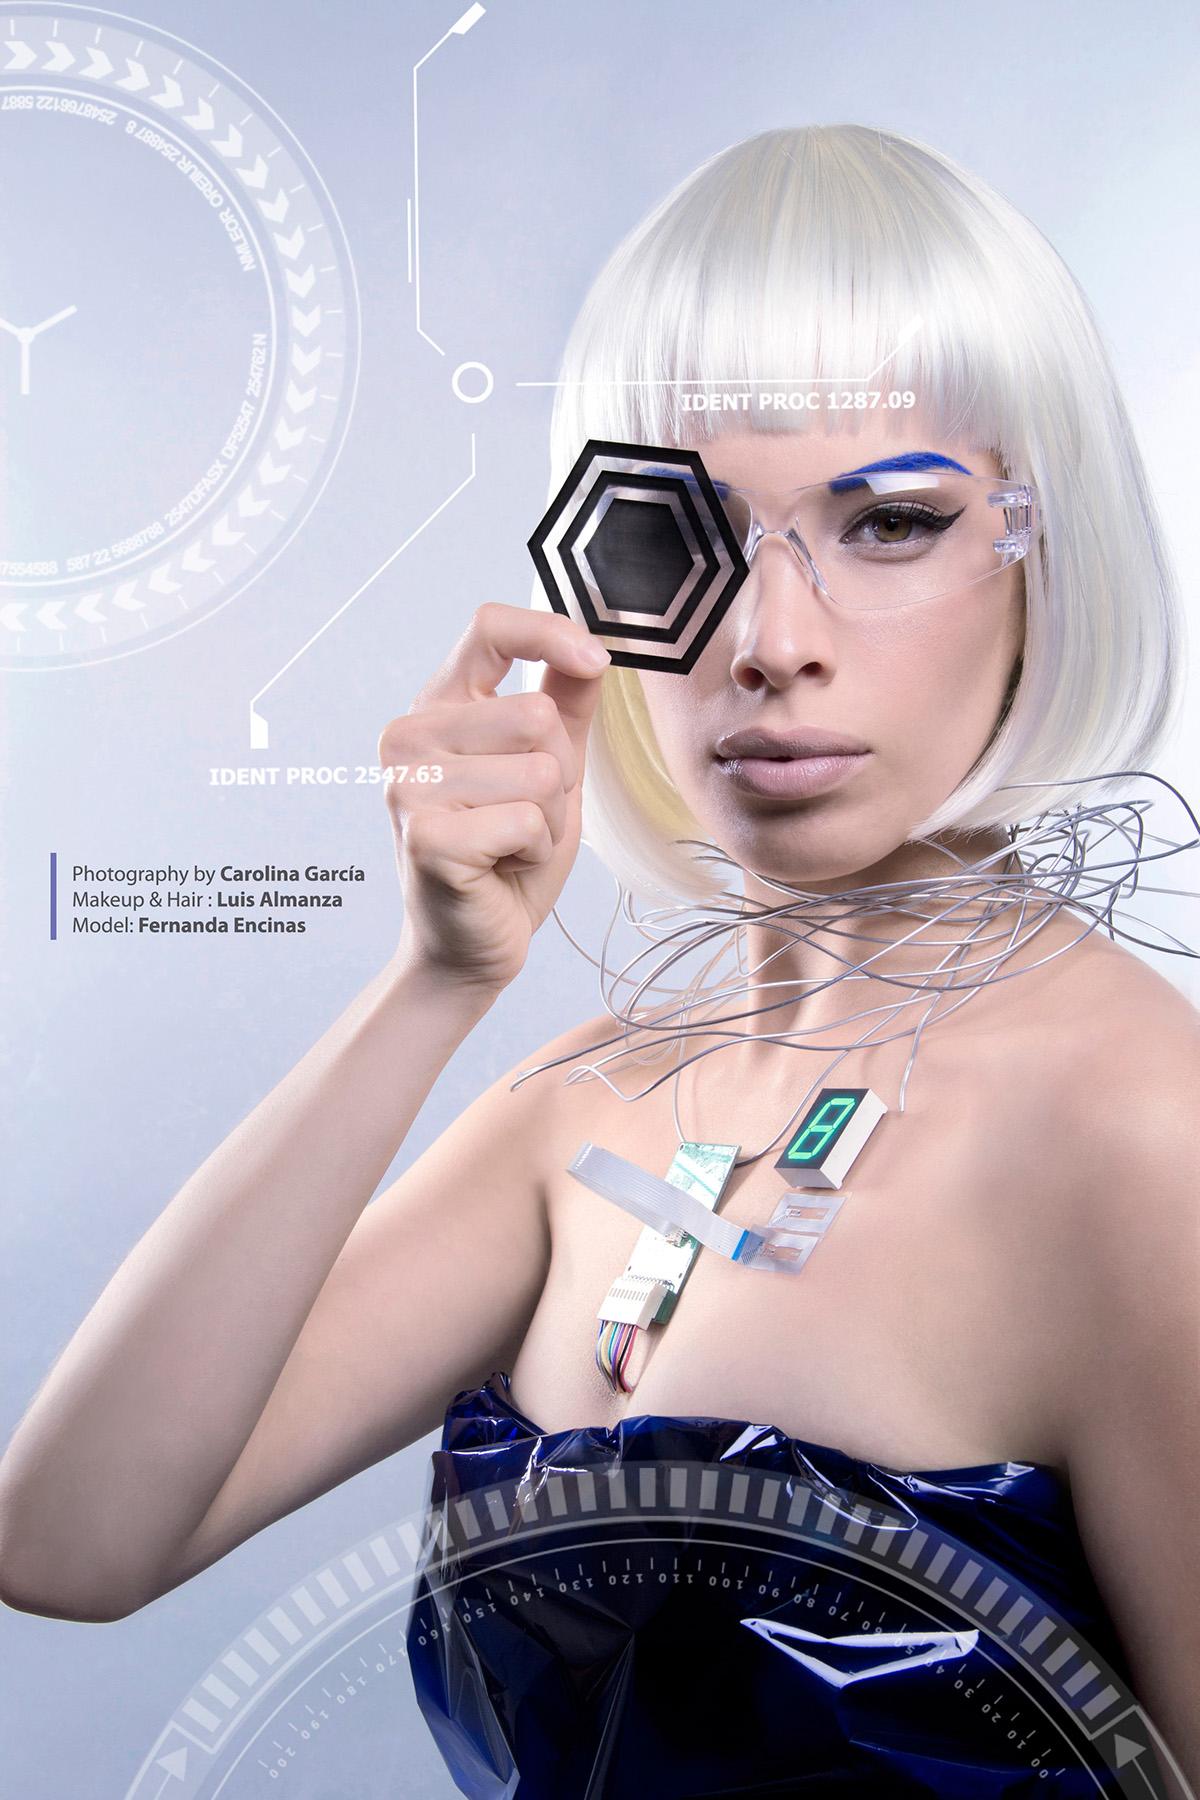 art FUTURISM Style